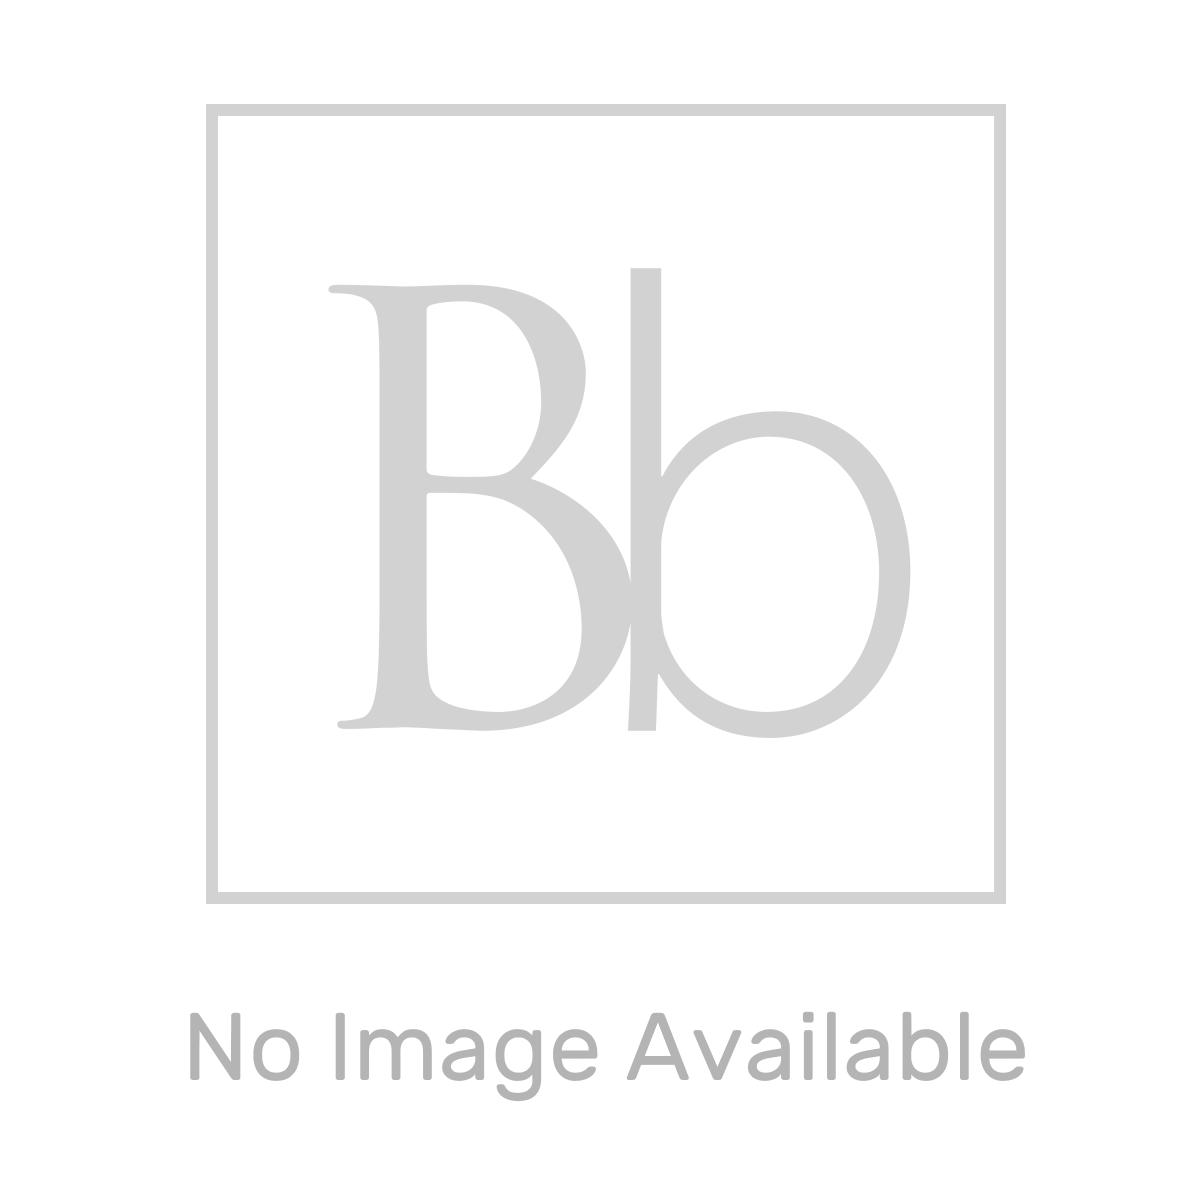 April Square Anti Slip Shower Tray 760 x 760 Line Drawing